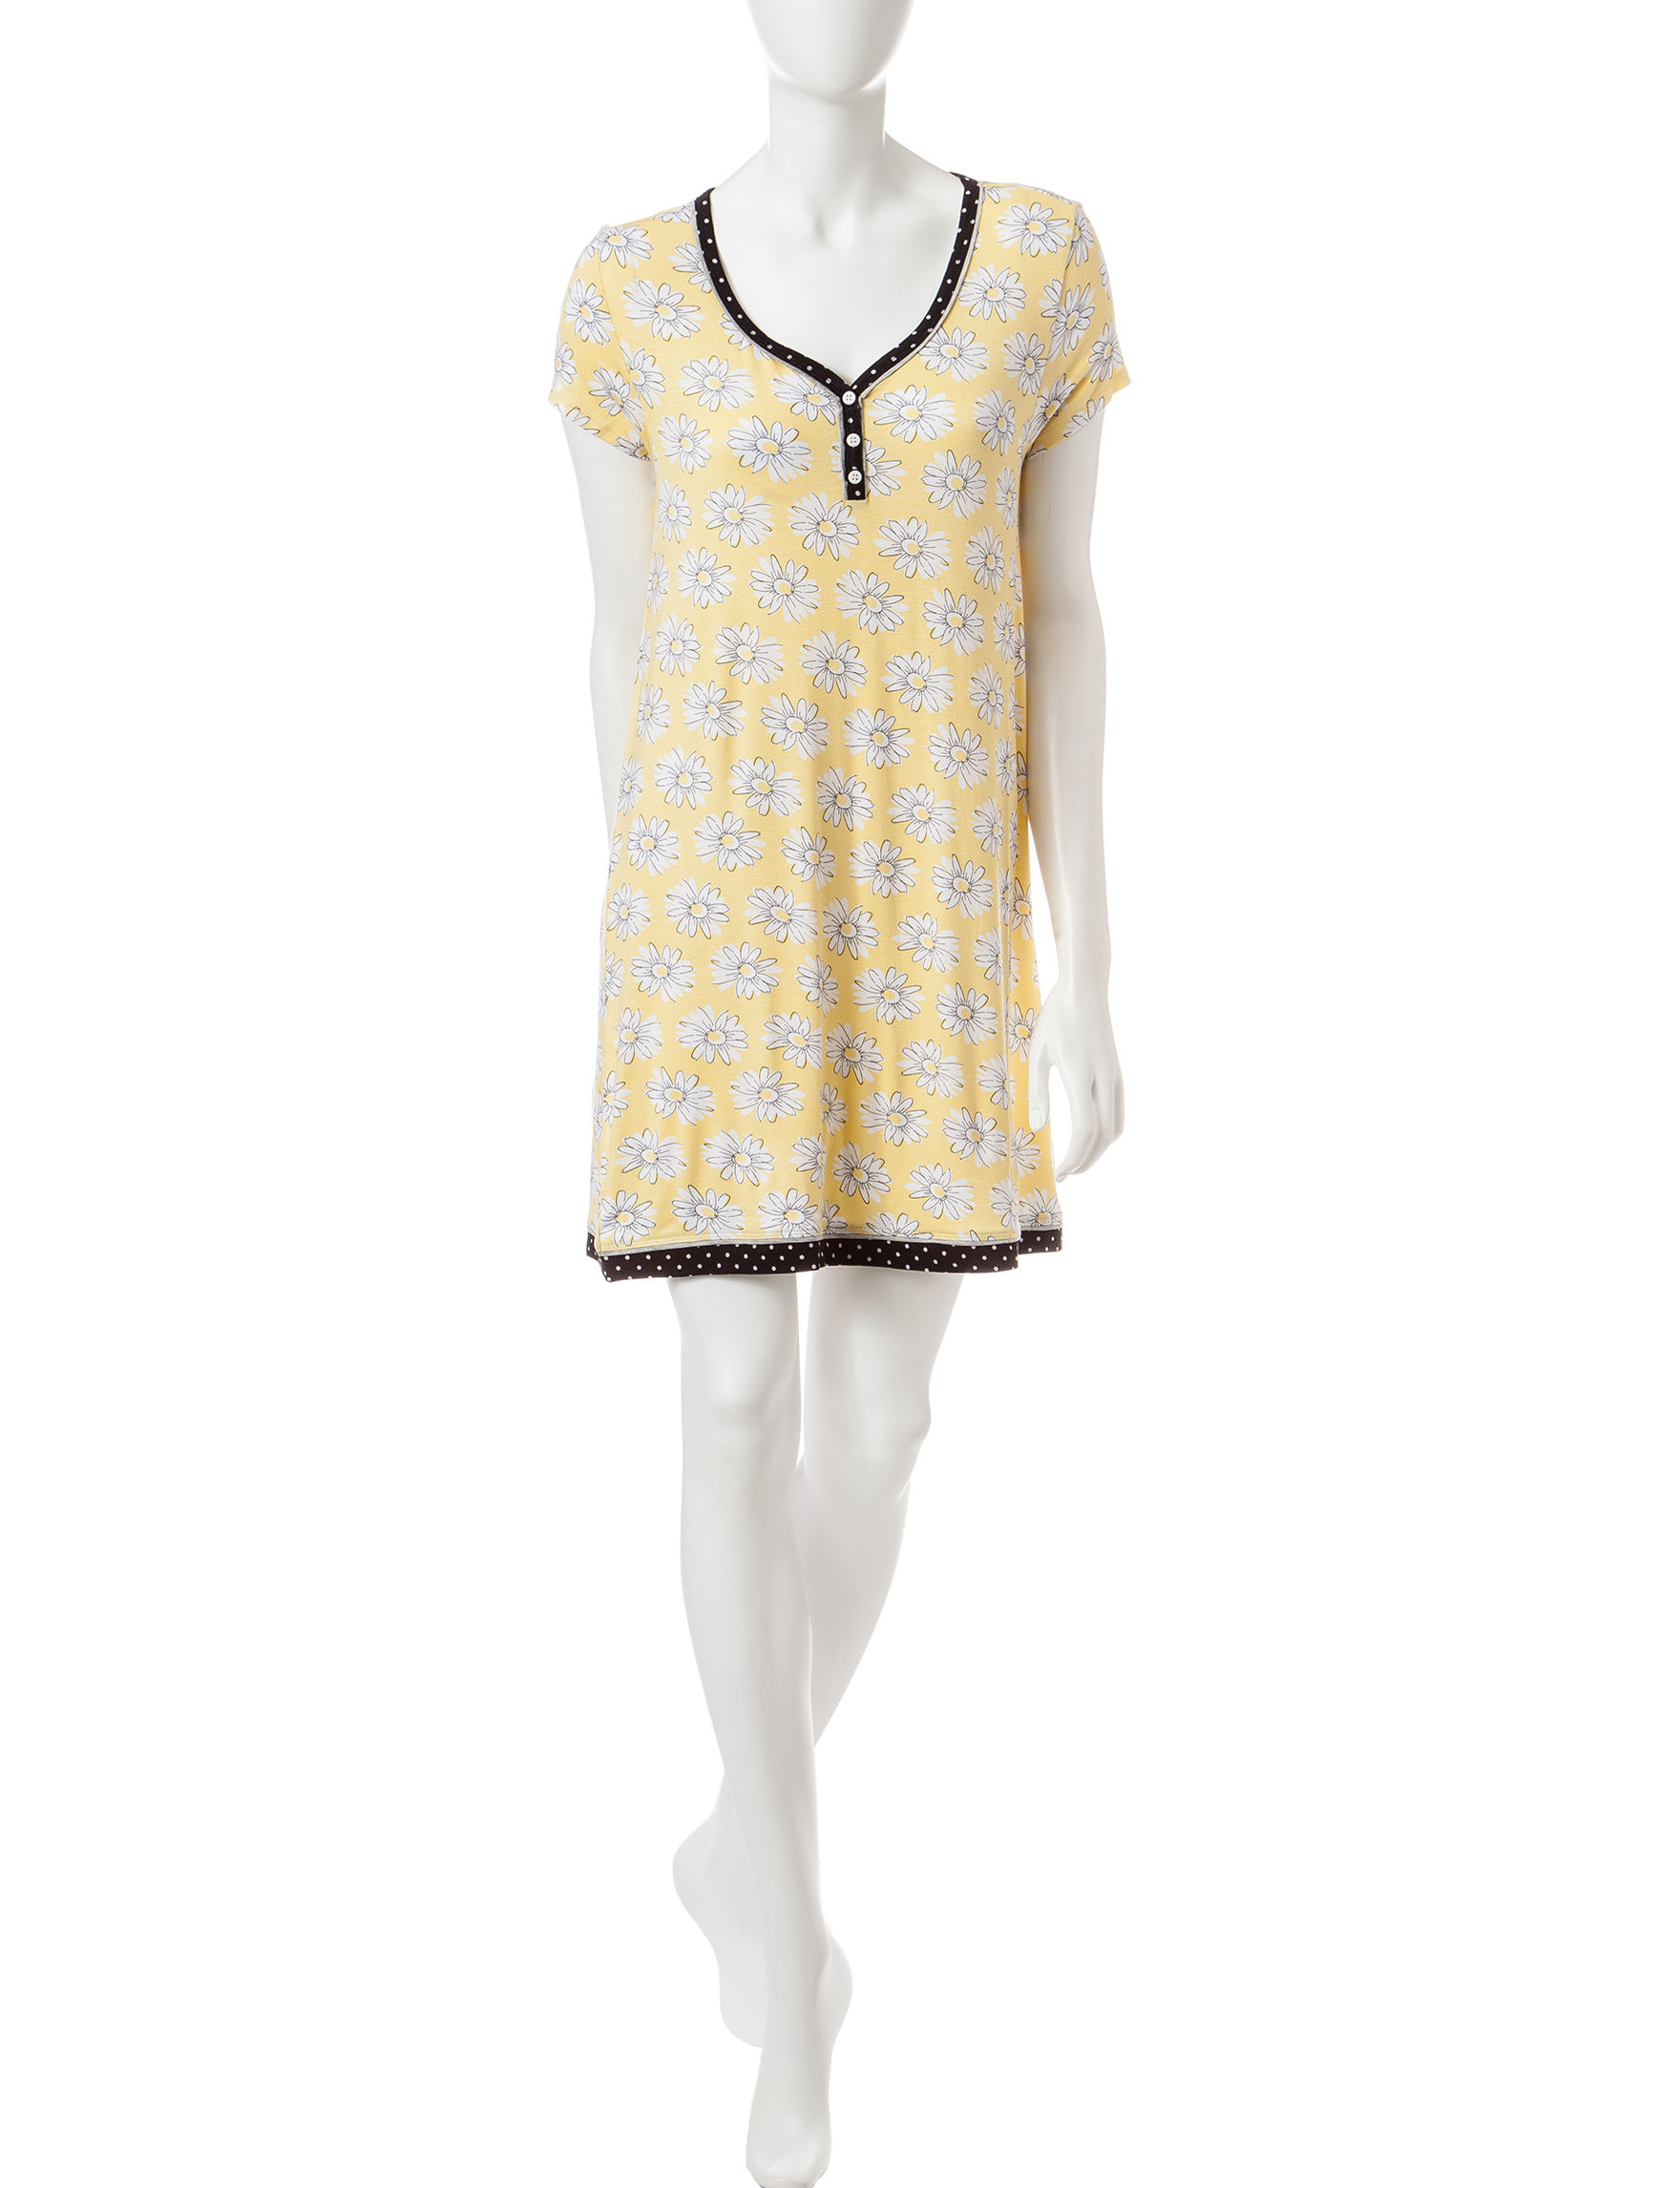 Rene Rofe Pink Multi Nightgowns & Sleep Shirts